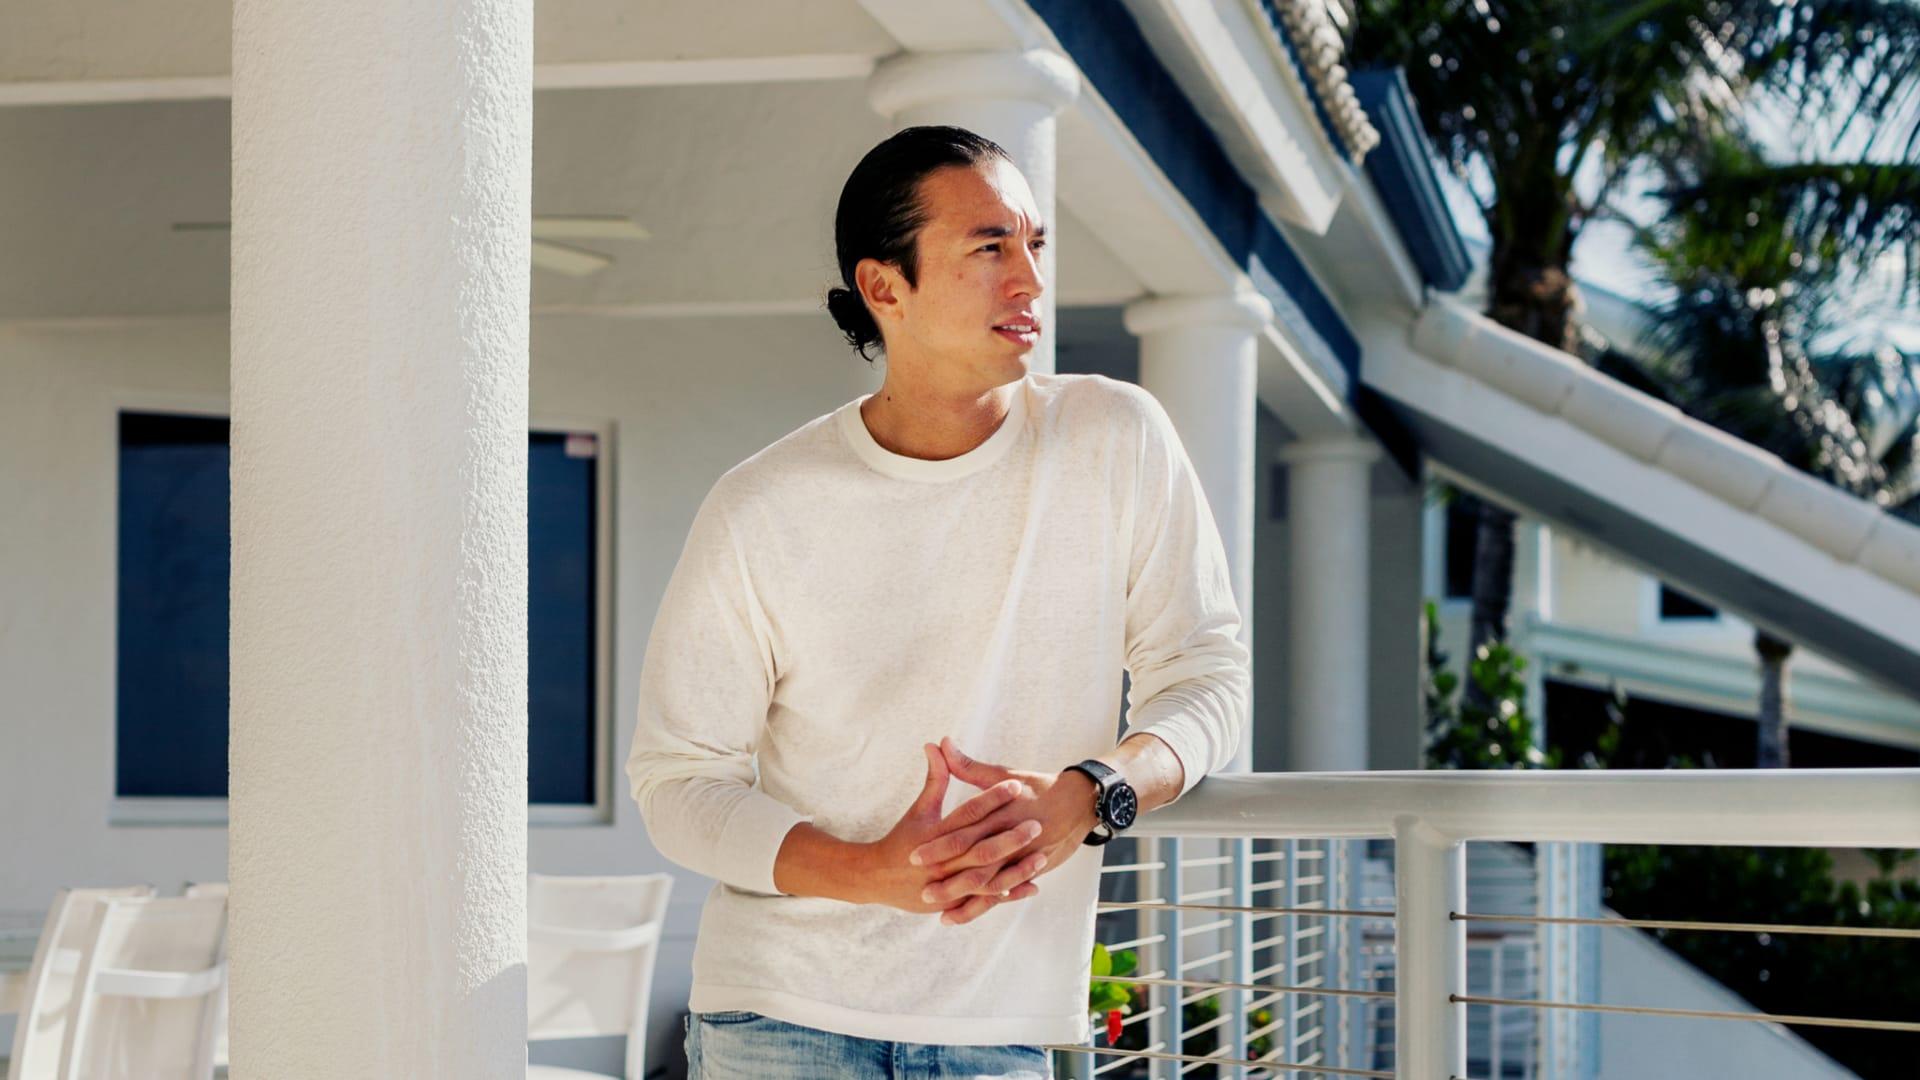 Josh Schuster, co-founder of Silverback Development.